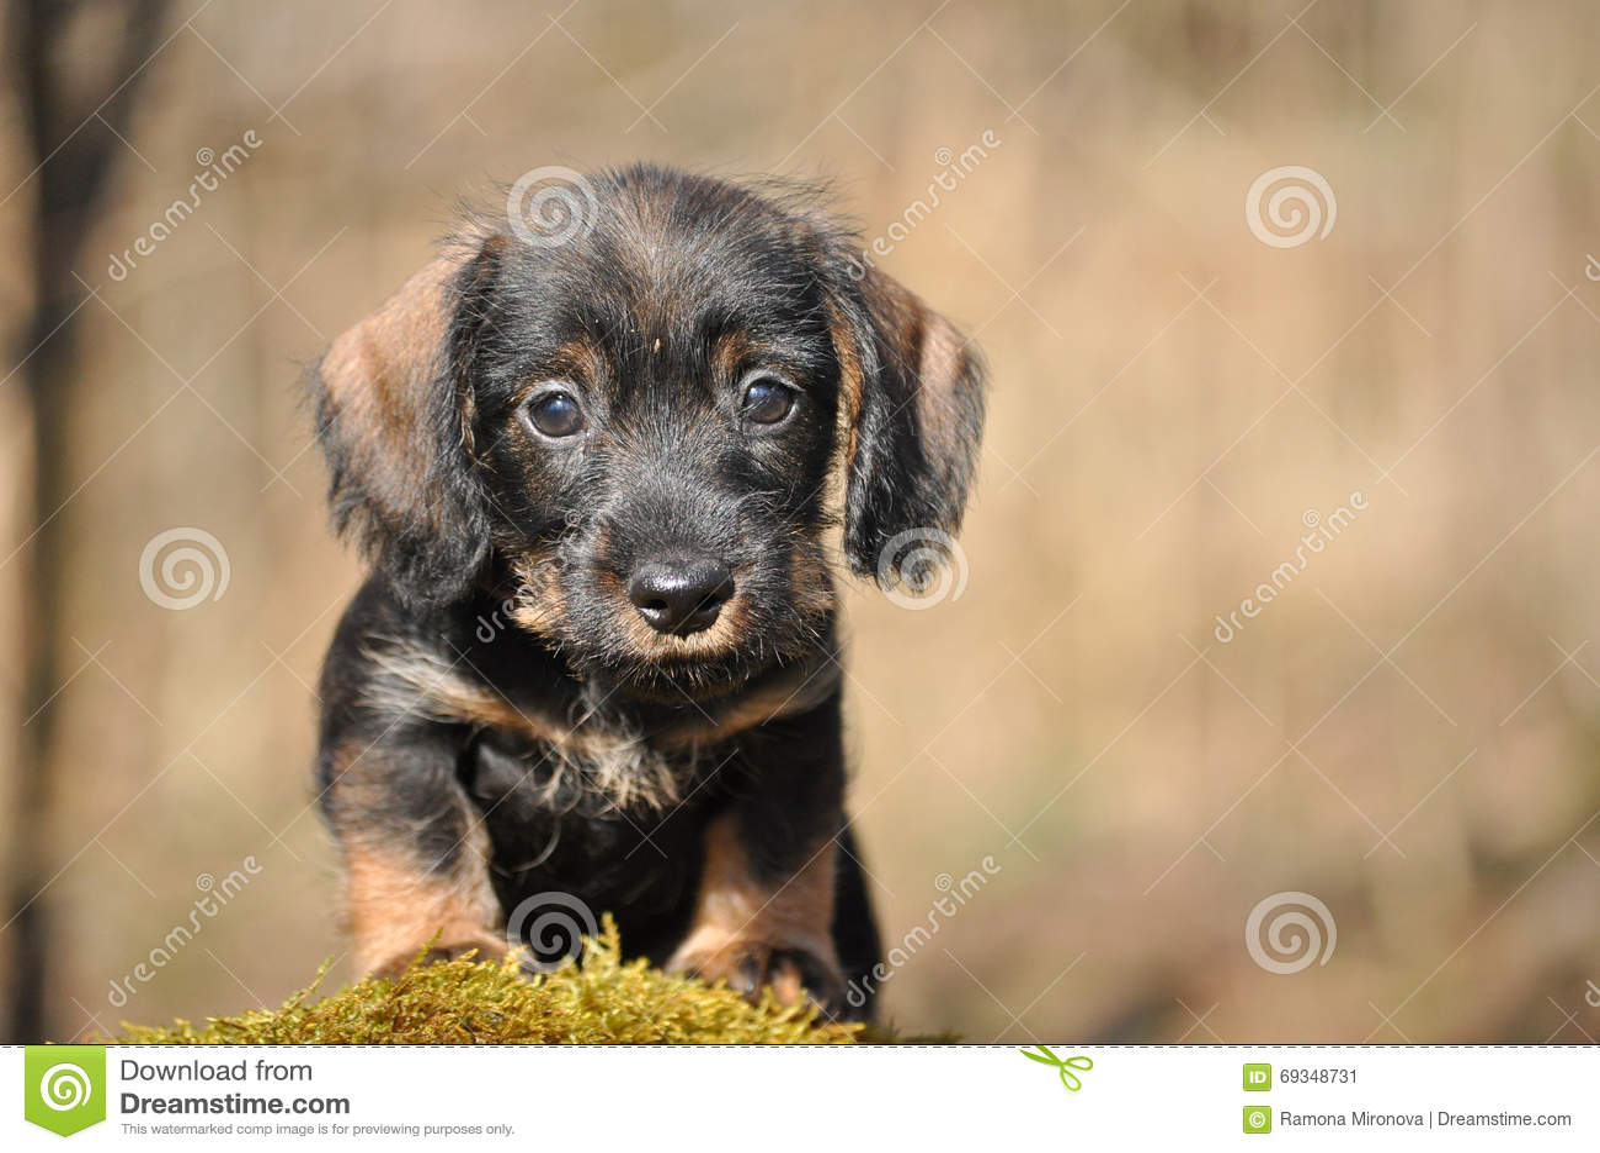 Dachshund Puppy Stock Image Image Of Kids Stump Puppy 69348731